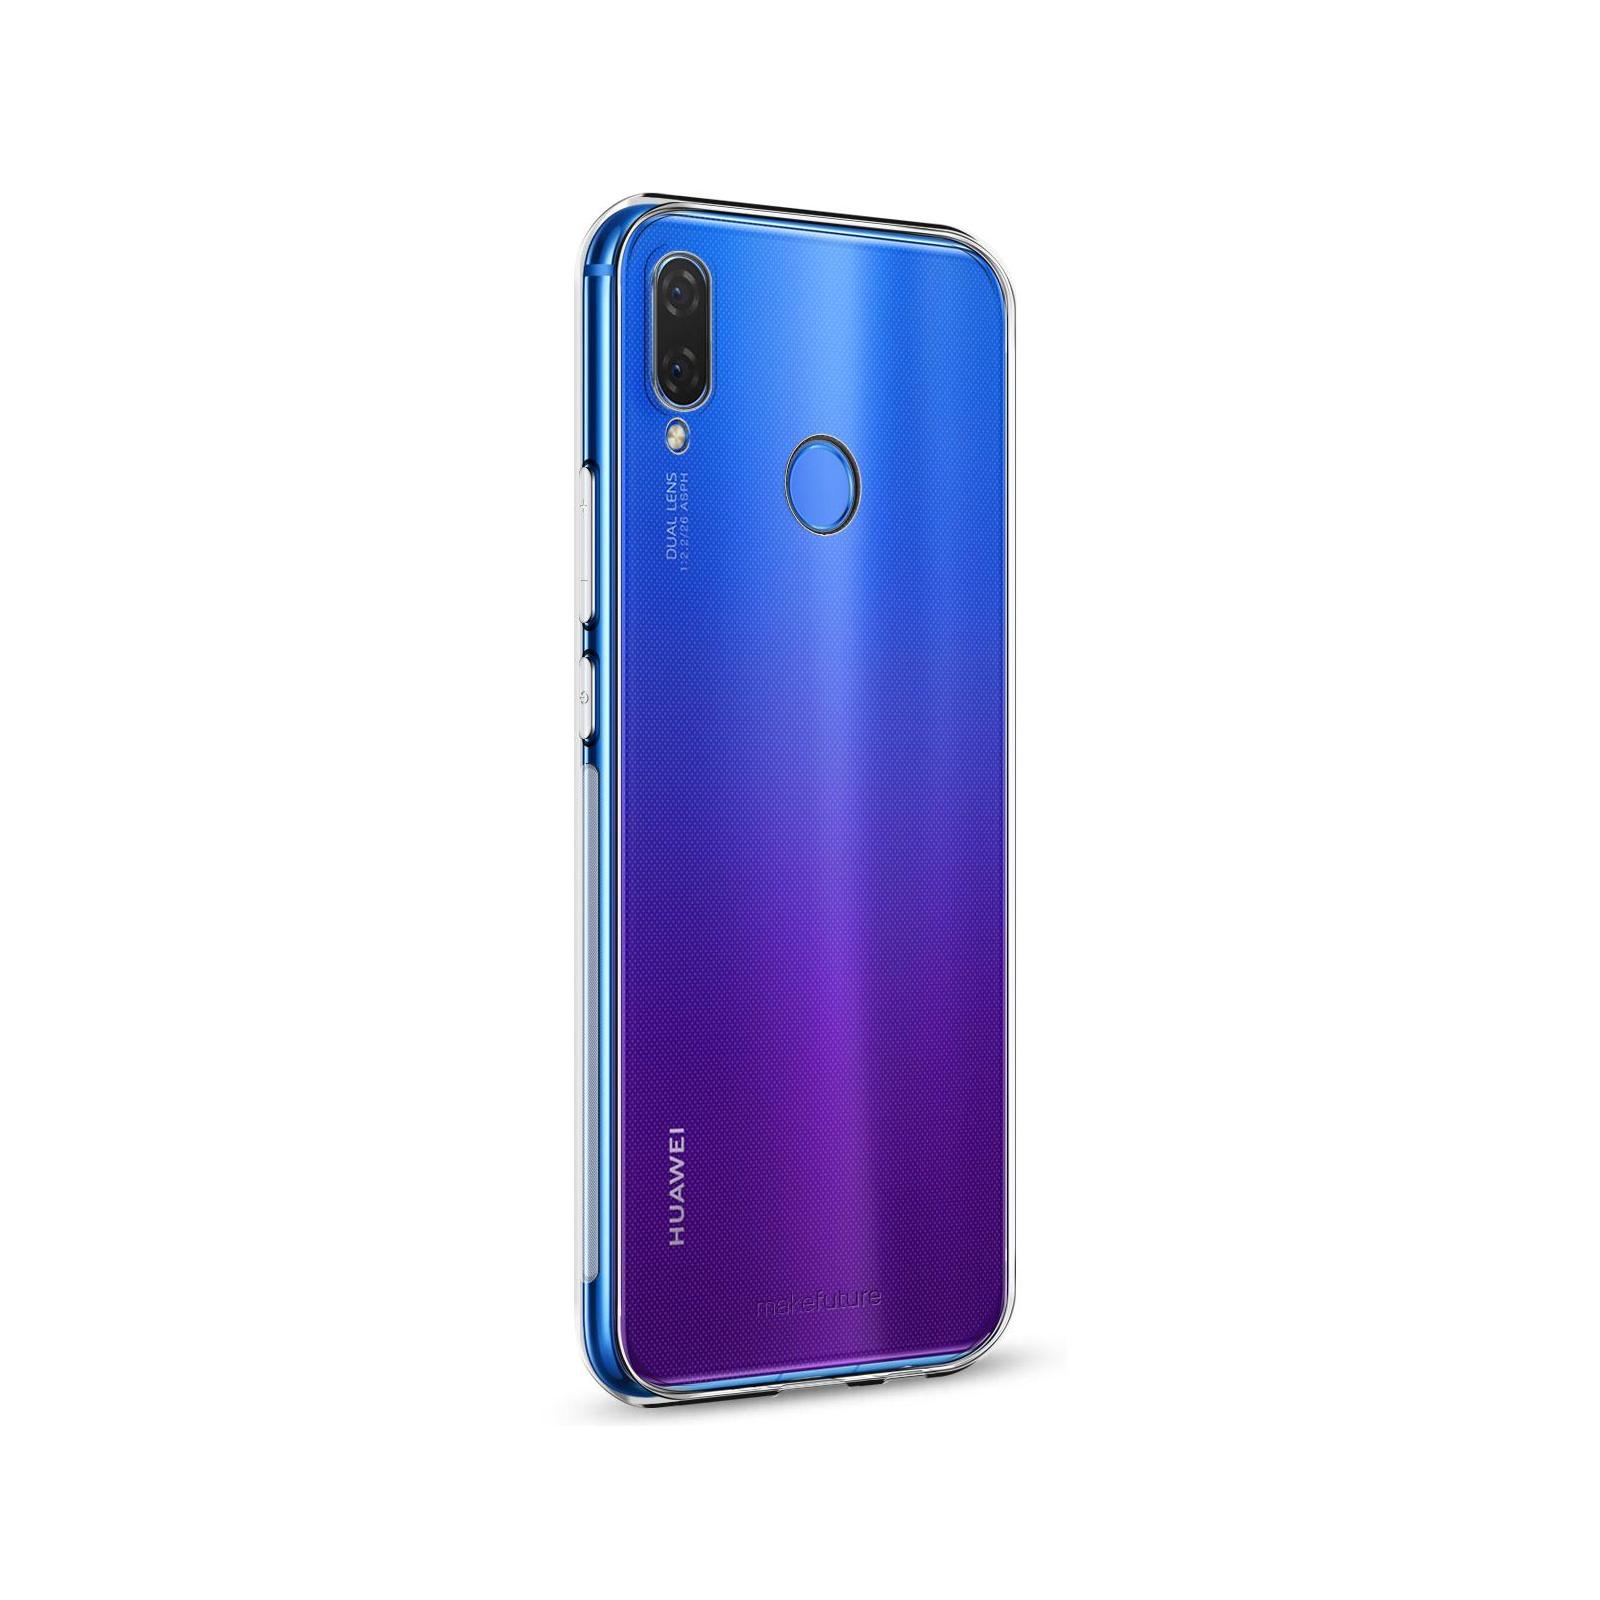 Чехол для моб. телефона MakeFuture Air Case (TPU) Huawei P Smart Plus Clear (MCA-HUPSPCL) изображение 2